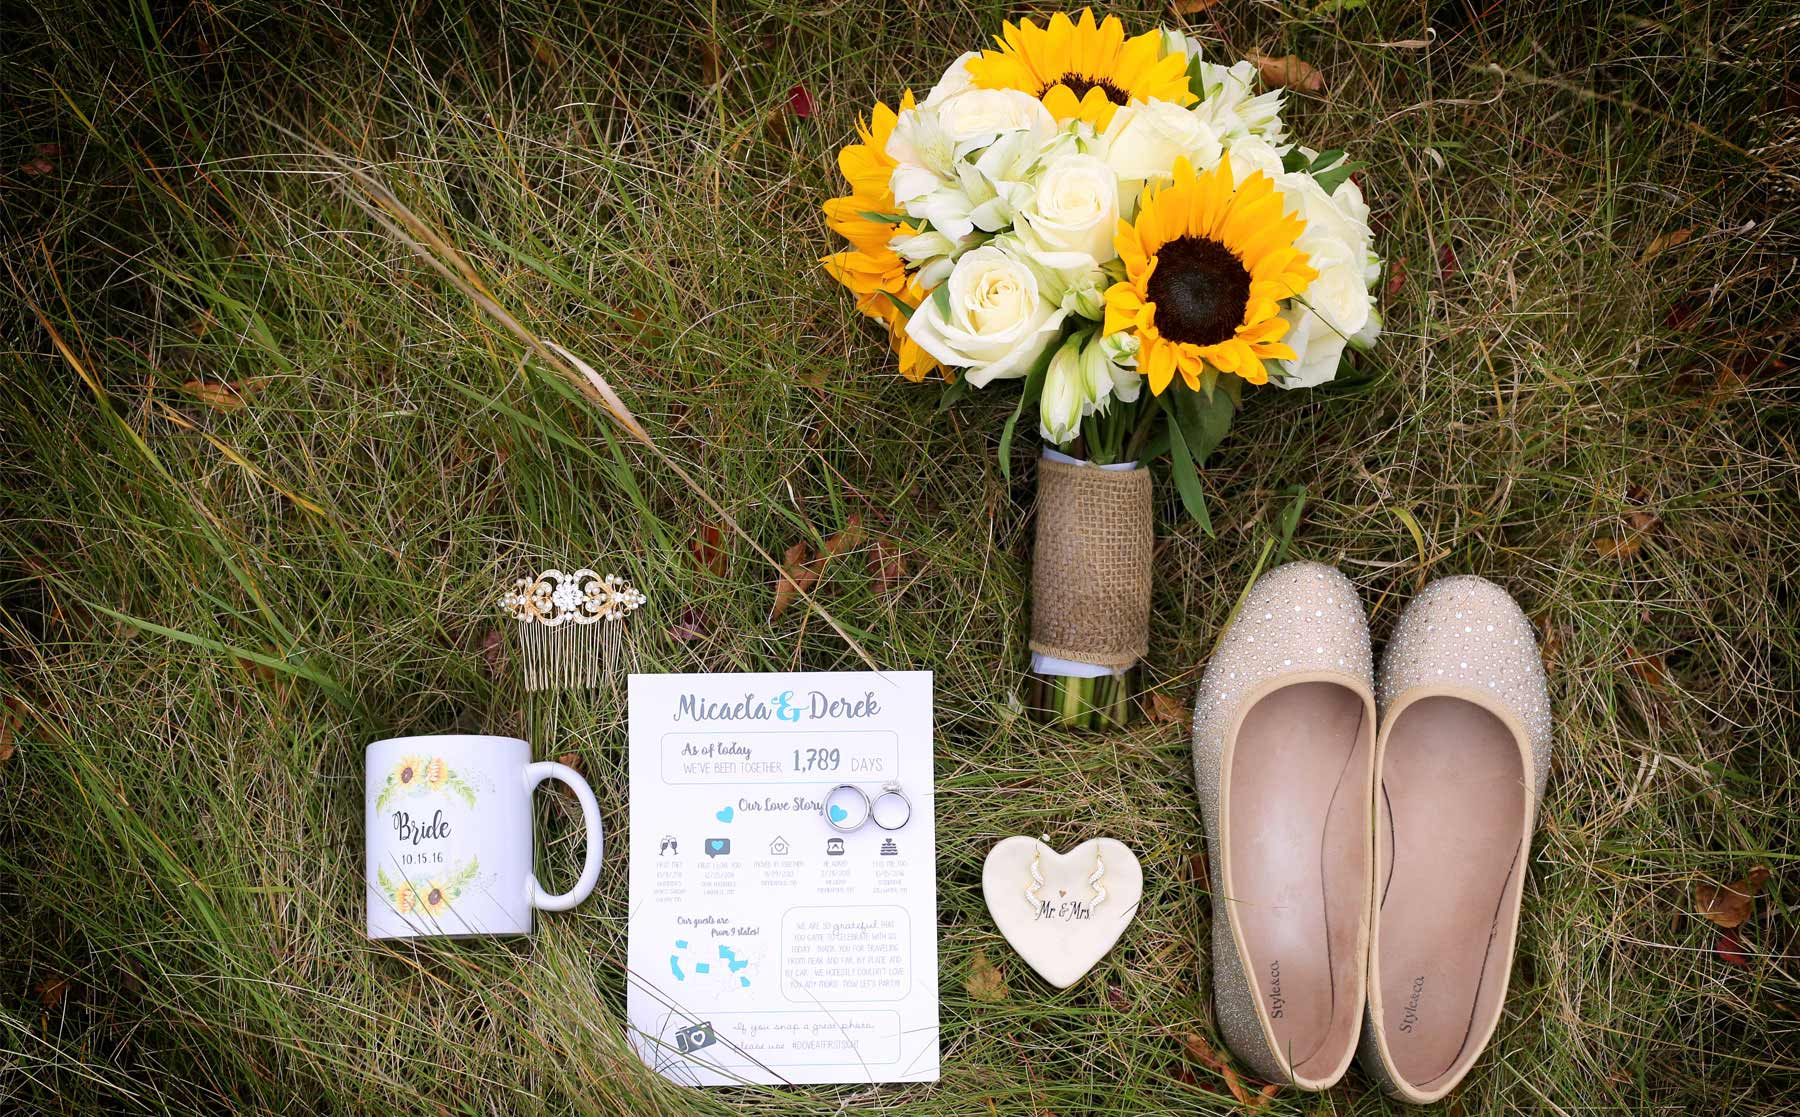 01-Stillwater-Minnesota-Wedding-Photographer-by-Andrew-Vick-Photography-Fall-Autumn-StoneRidge-Golf-Club-Getting-Ready-Flowers-Shoes-Jewelry-Hair-Comb-Earrings-Rings-Mug-Program-Grass-Micaela-and-Derek.jpg